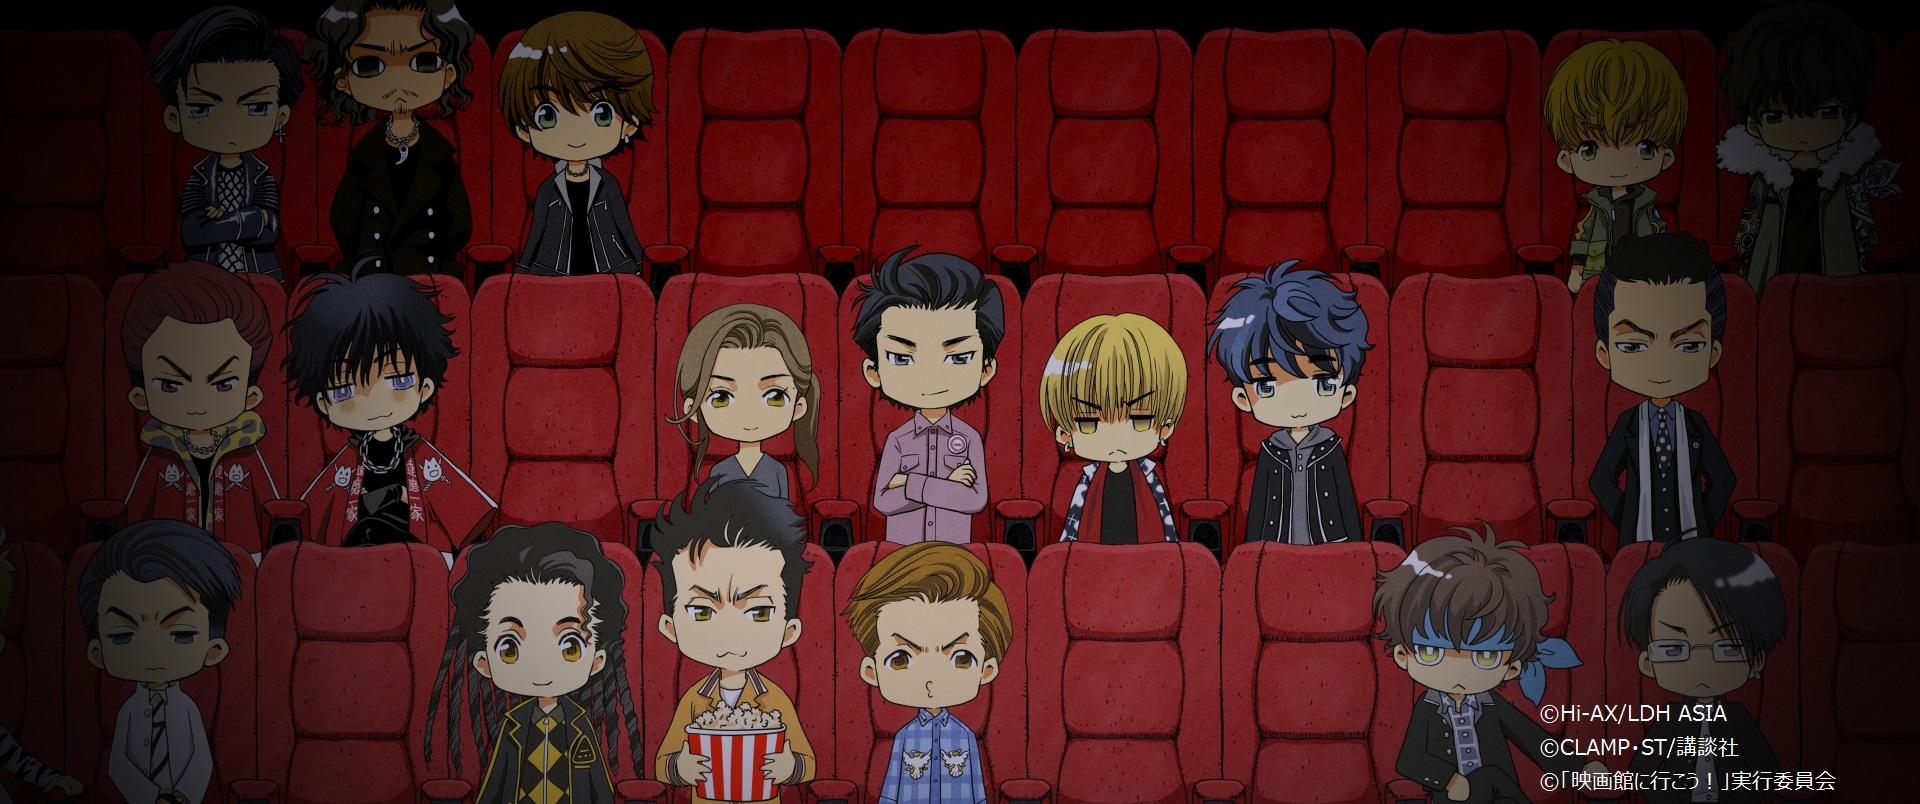 g-sword版映画泥棒 (C)「映画館に行こう!」実行委員会 (C)Hi-AX/LDH ASIA (C)CLAMP・ST/講談社